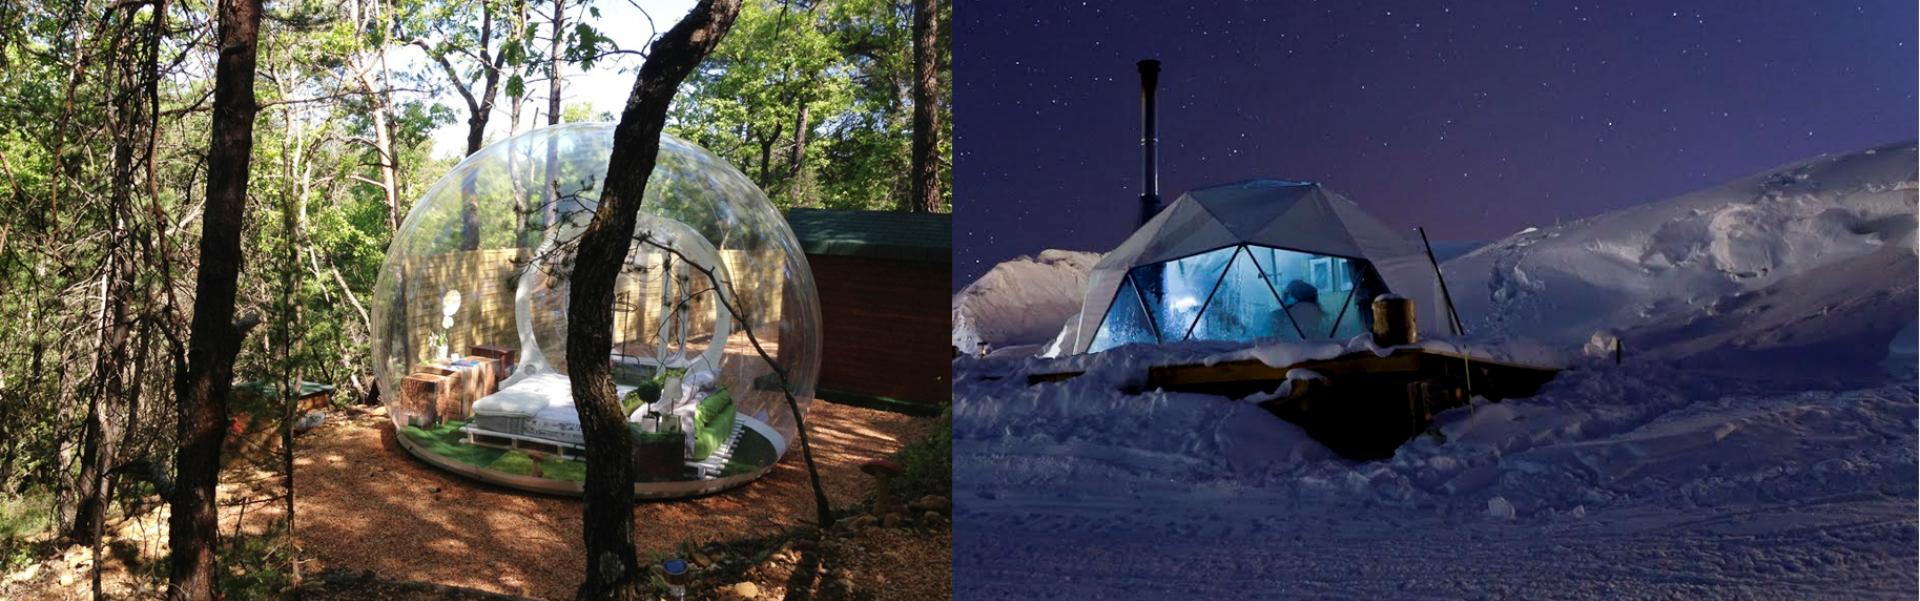 blog homair les plus belles vacances en camping homair le blog. Black Bedroom Furniture Sets. Home Design Ideas